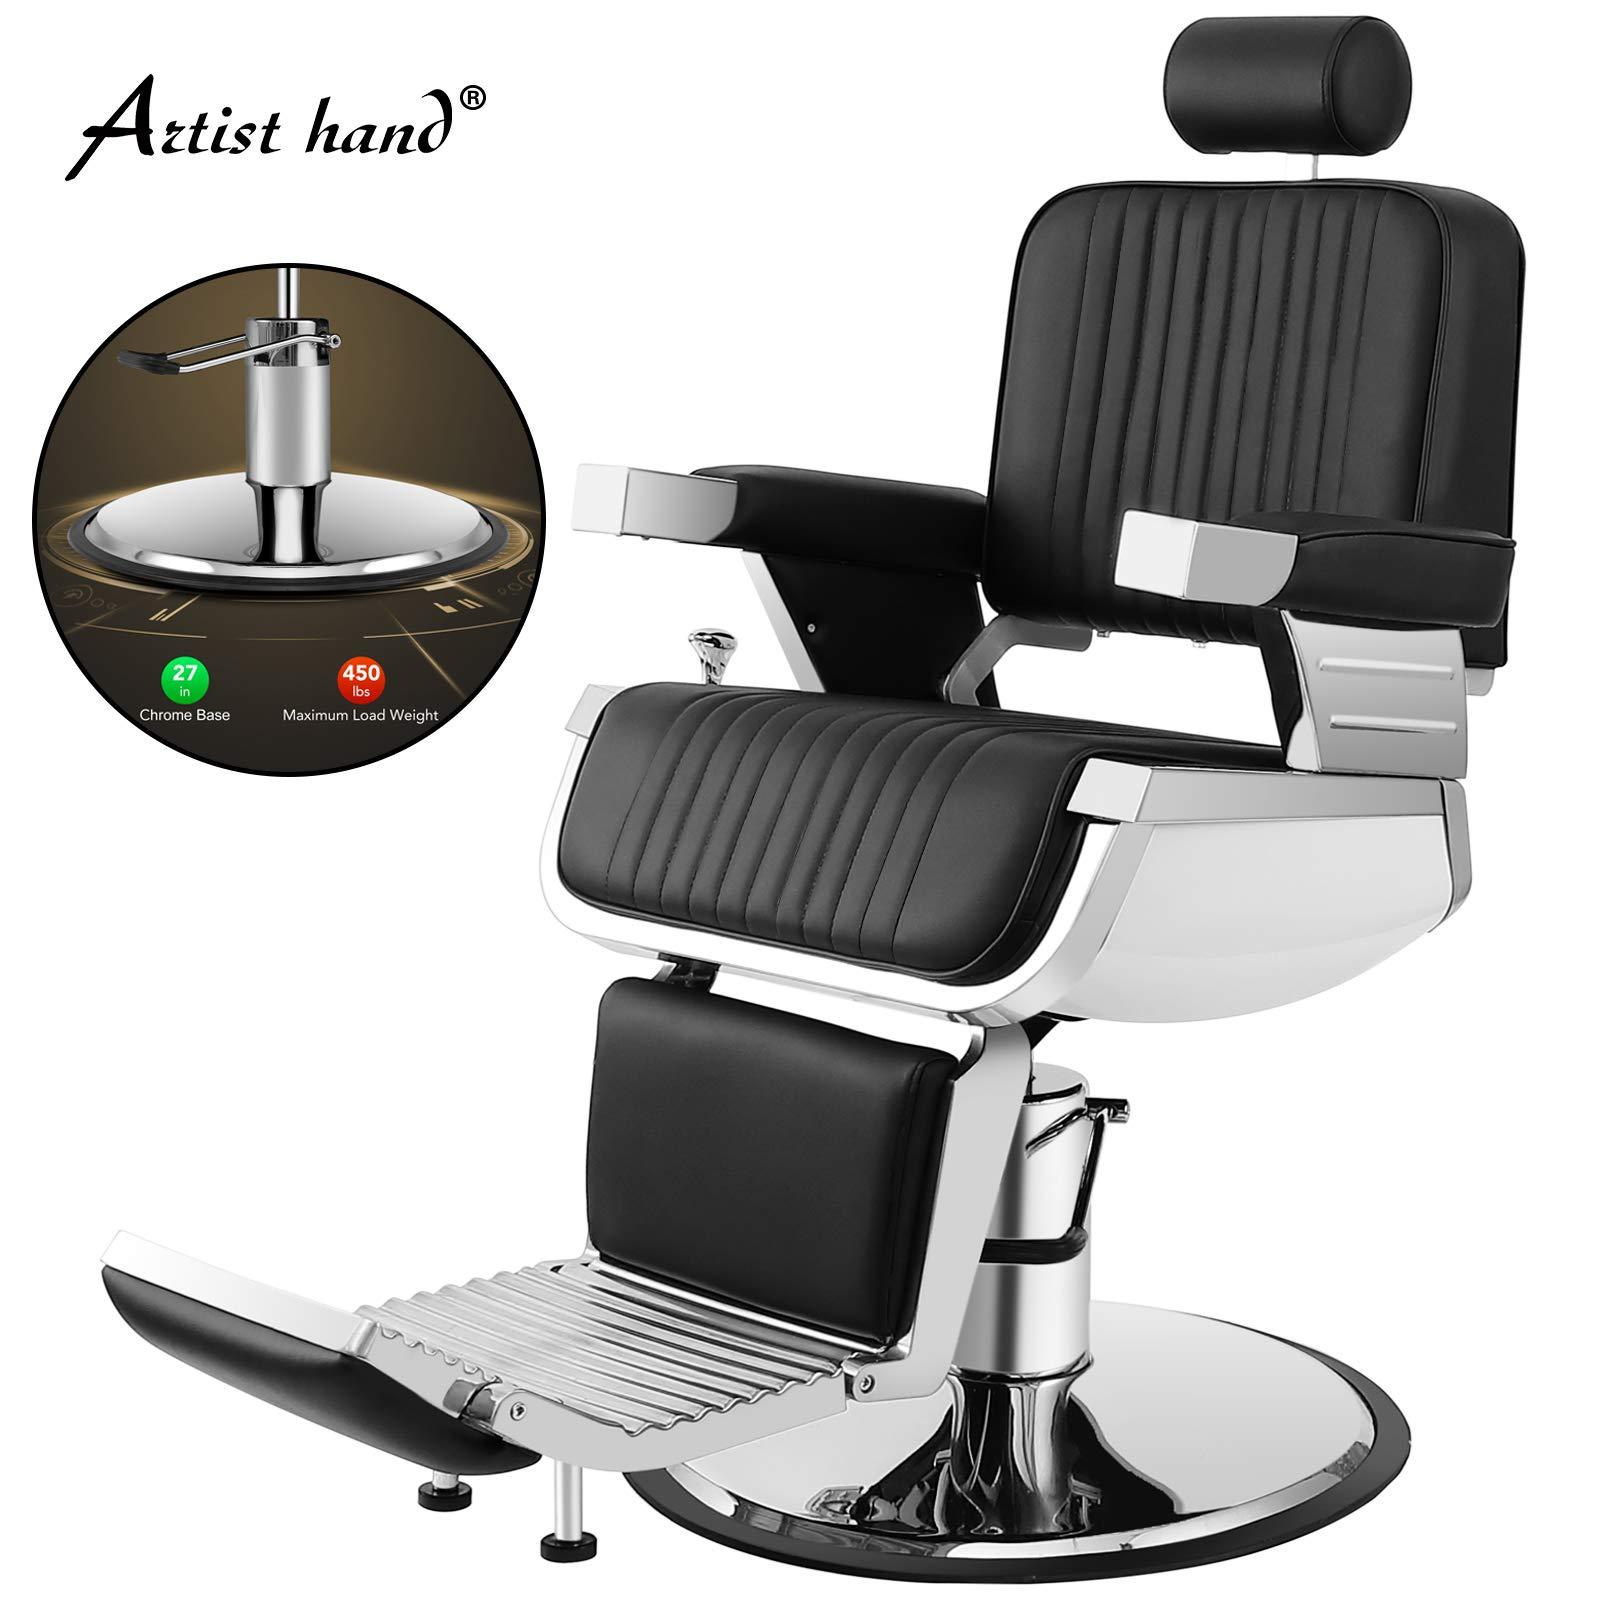 Artist Hand Heavy Duty Hydraulic Recline Barber Chair Salon Chair Barber Chairs for Hair Stylist Tattoo Chair Barber Salon Equipment (Black) by Artist Hand